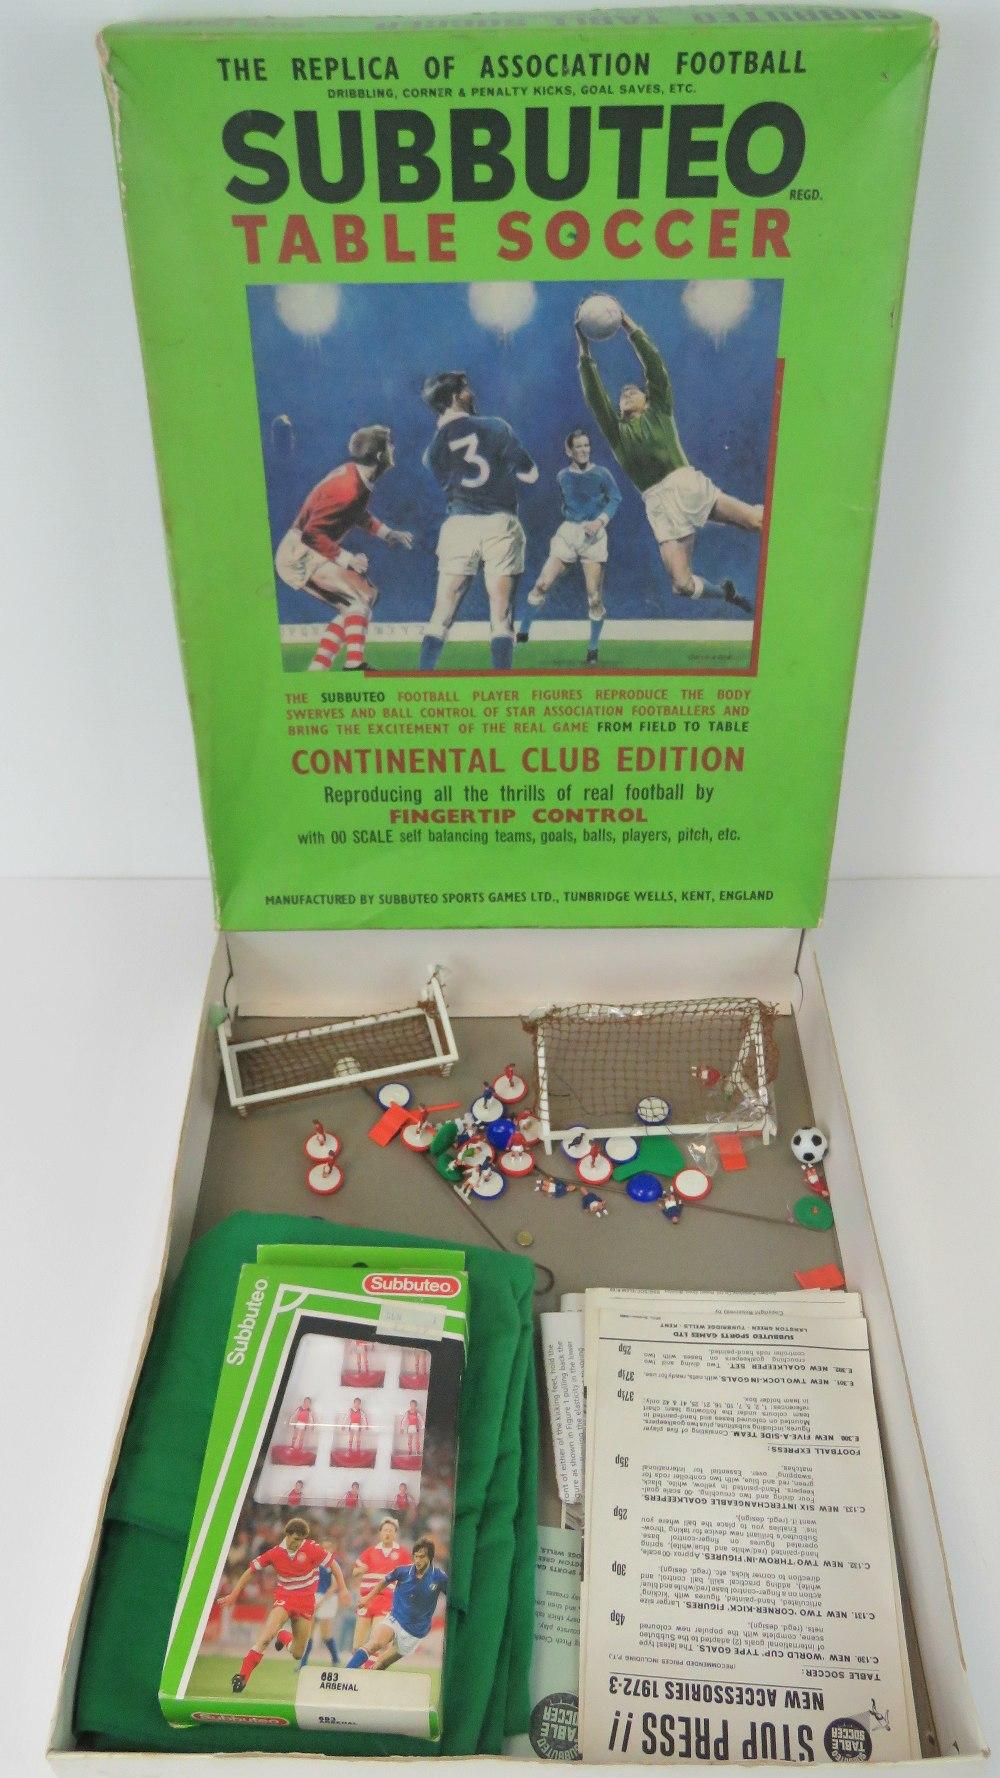 Lot 254 - Subbuteo Table Soccer (Continental Club